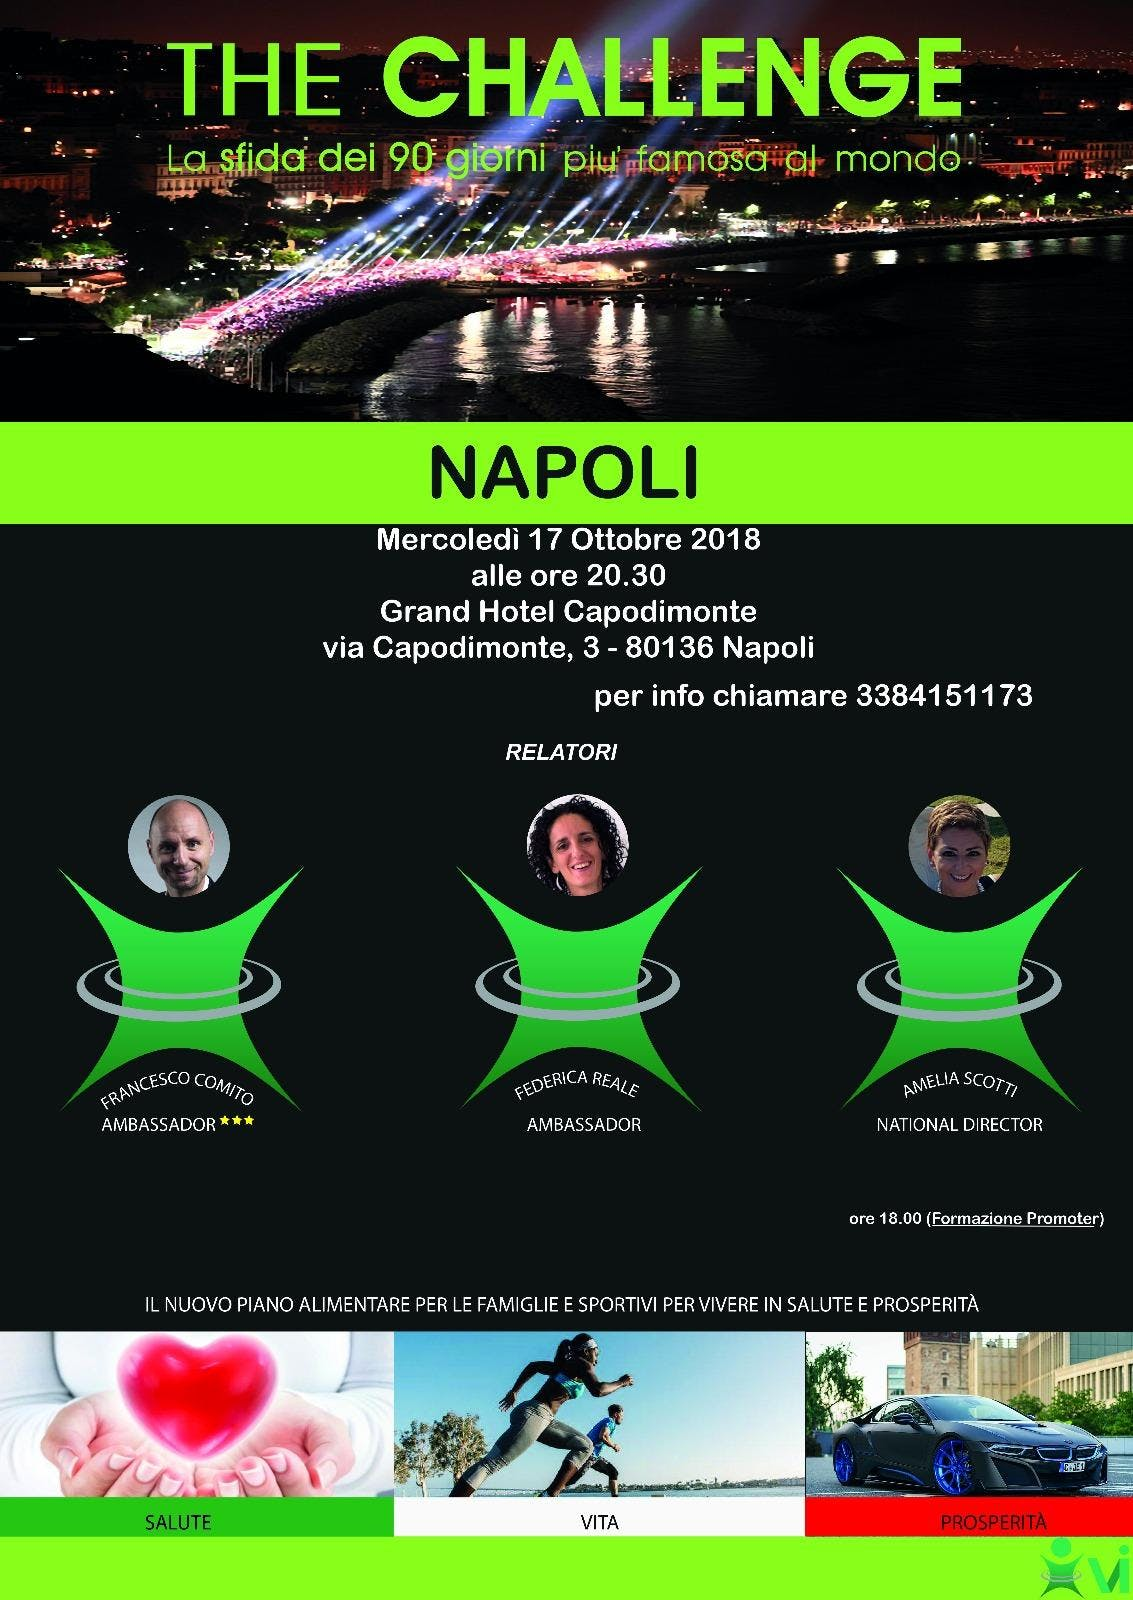 THE CHALLENGE NAPOLI